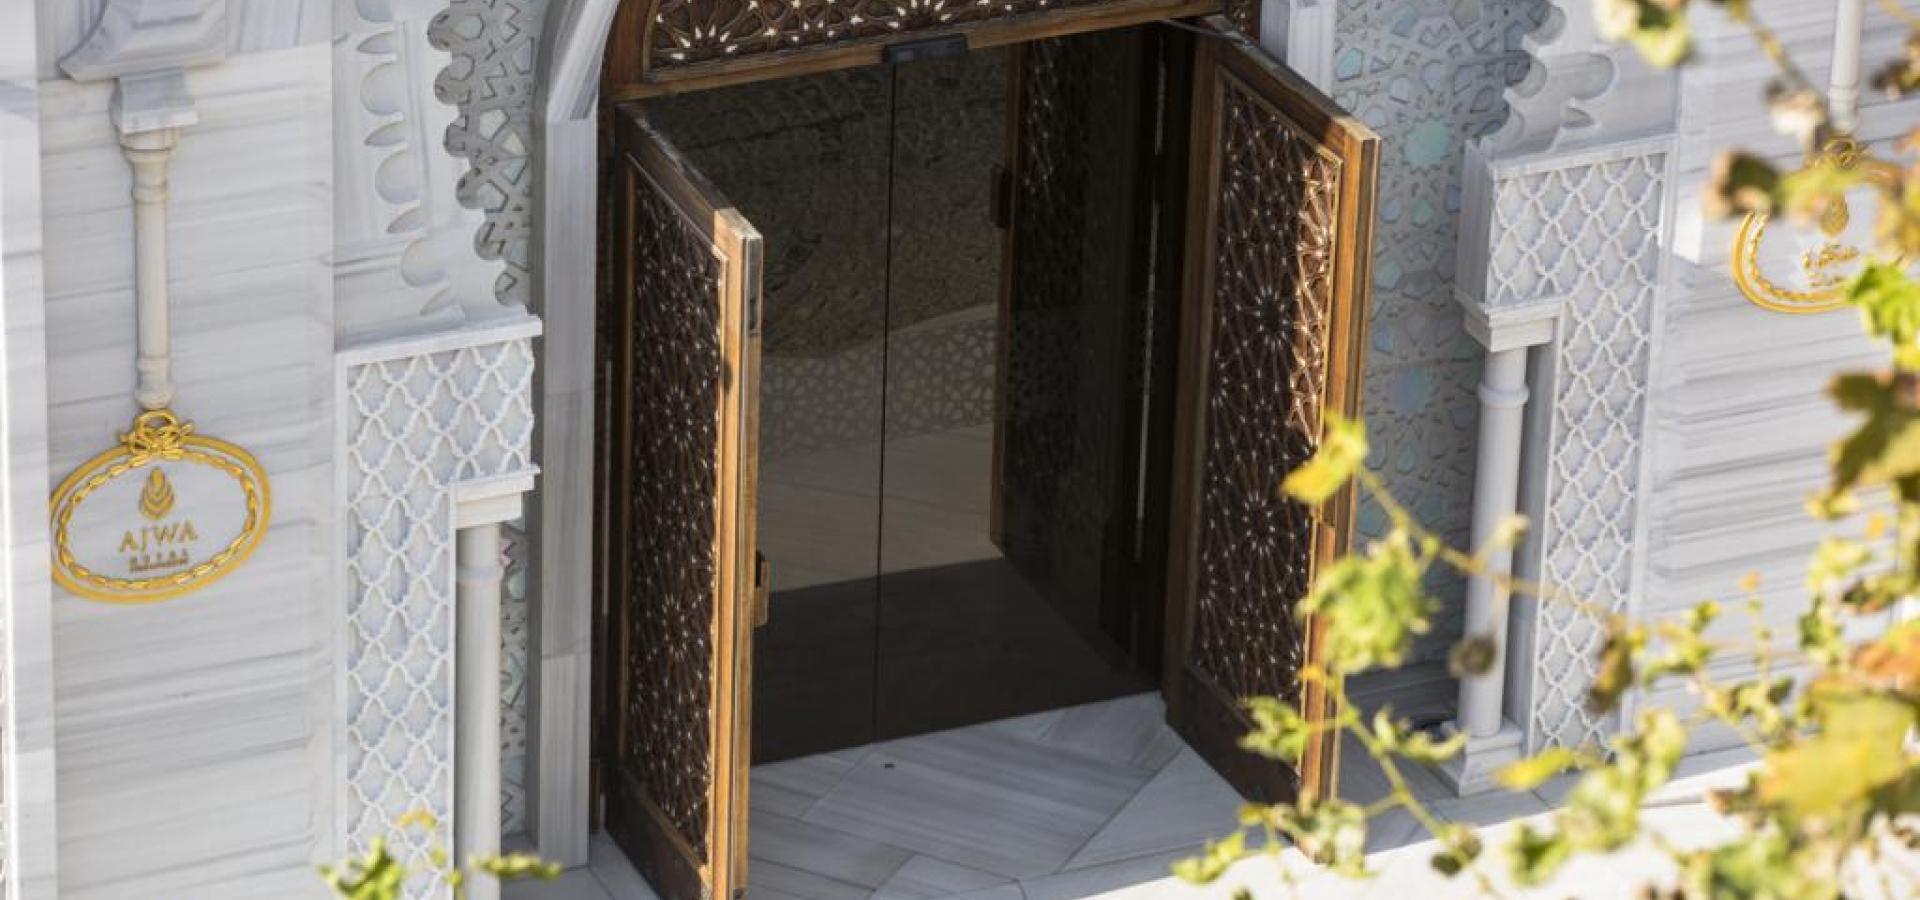 Turquia - Hotel Ajwa Sultanahmet